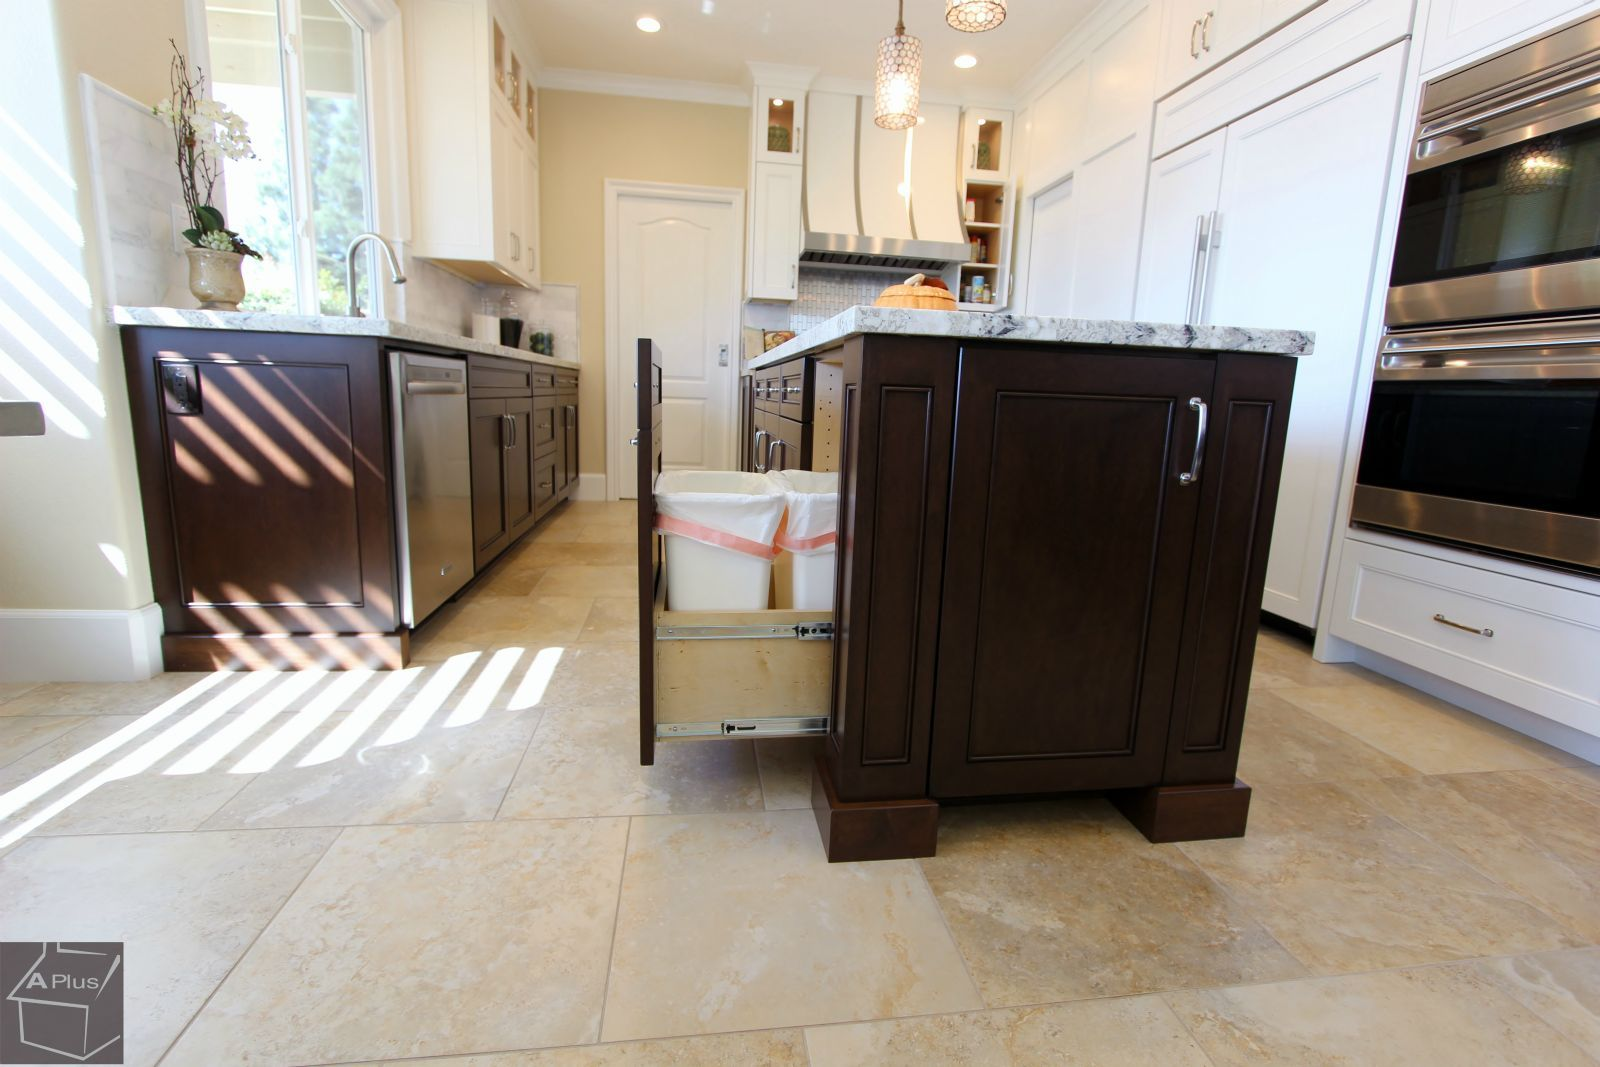 Yorba Linda Kitchen | 88 - Transitional Kitchen Remodel - Yorba ...